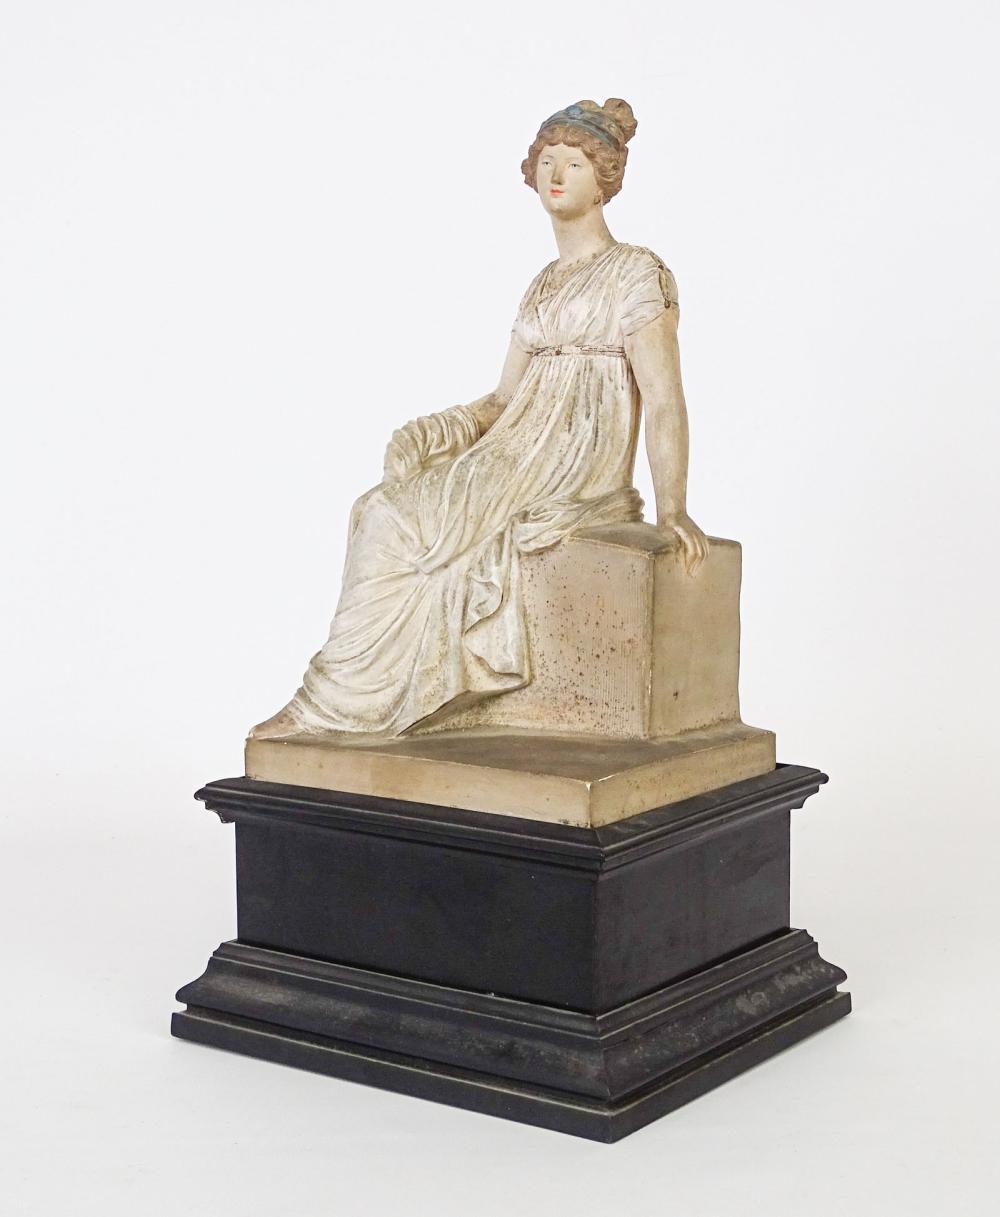 Rare Polychromed Clay Classical Figure